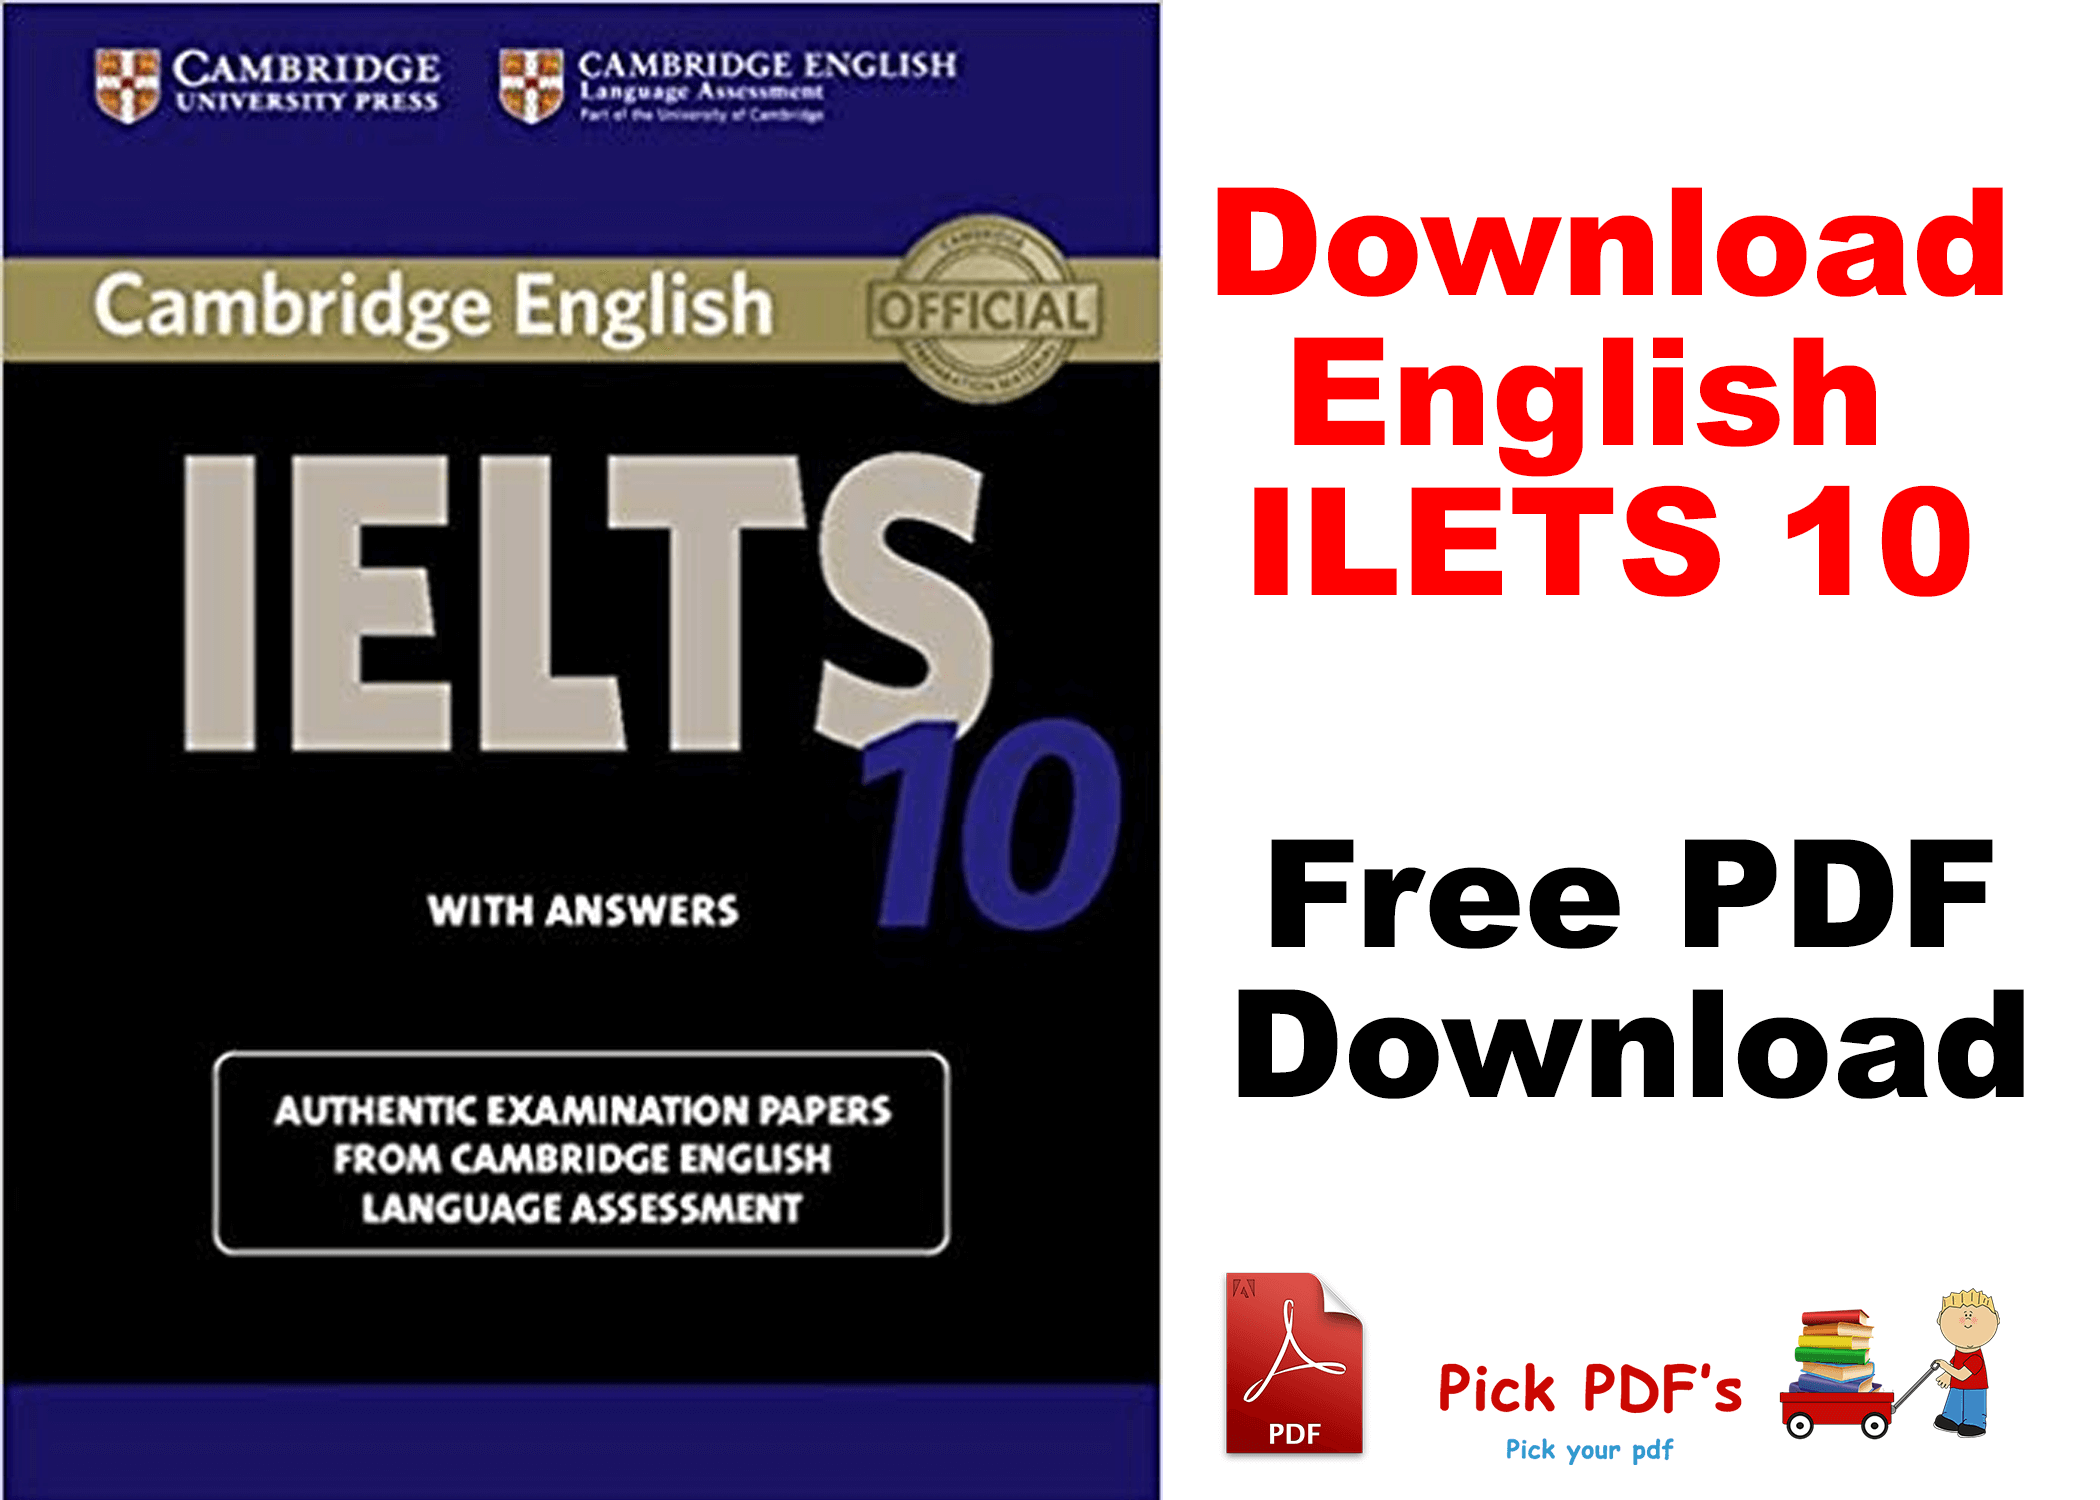 https://pickpdfs.com/best-practice-book-for-ielts-writing/